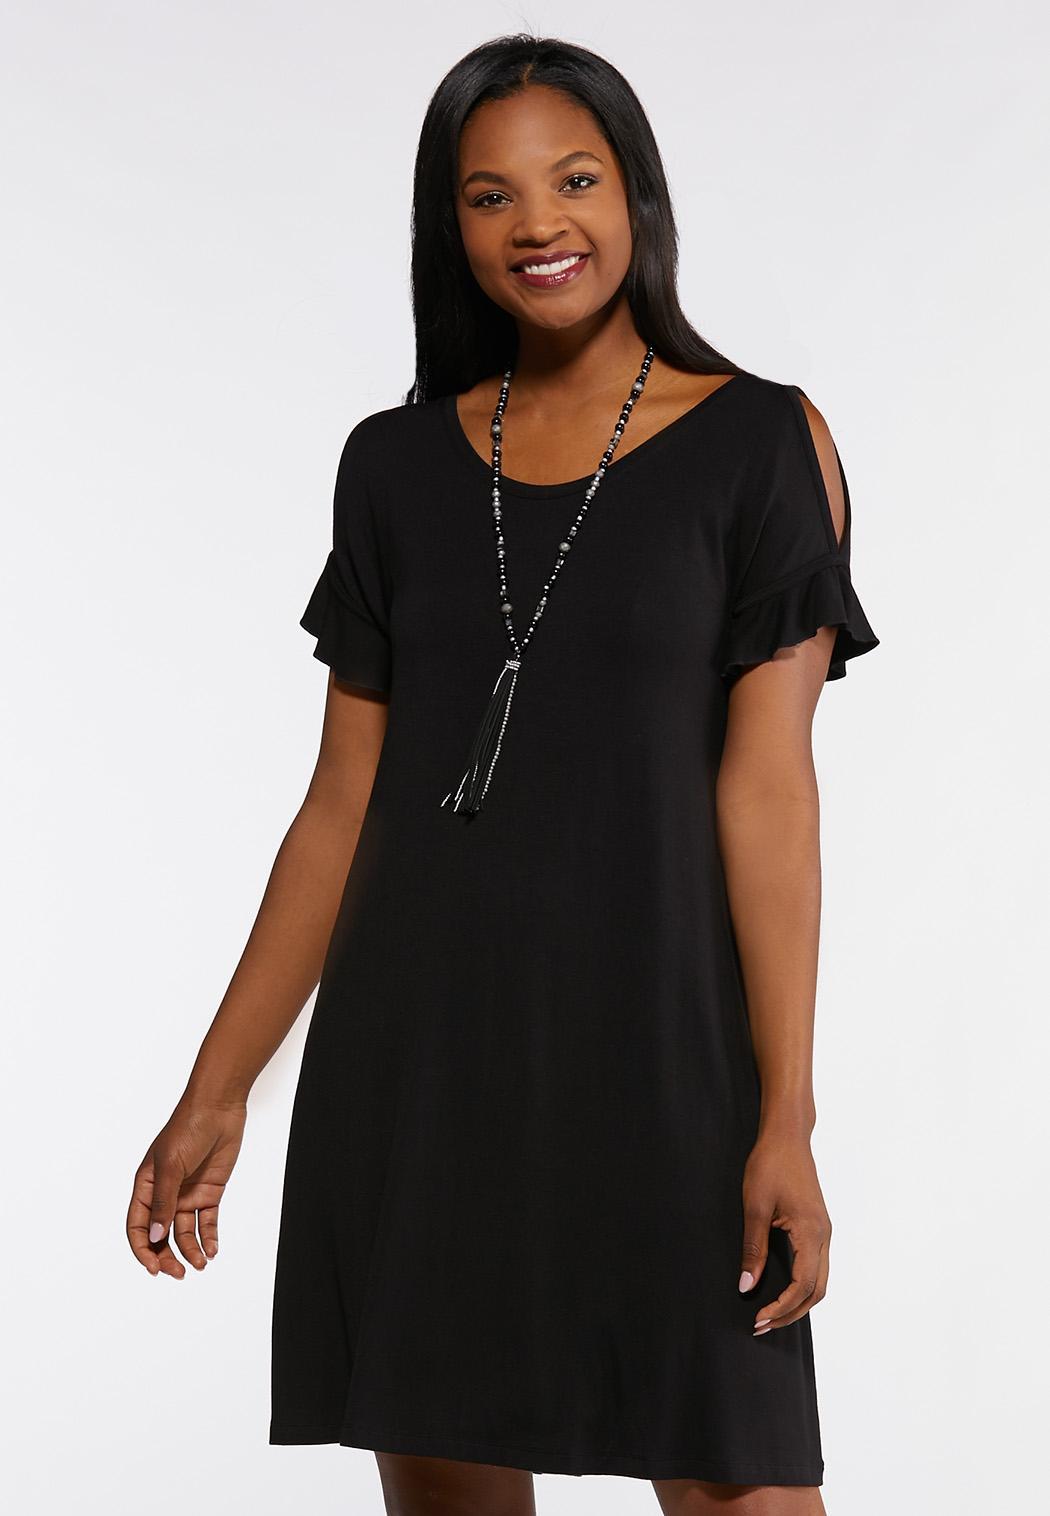 6d564020166f Plus Size Dresses For Women - Swing